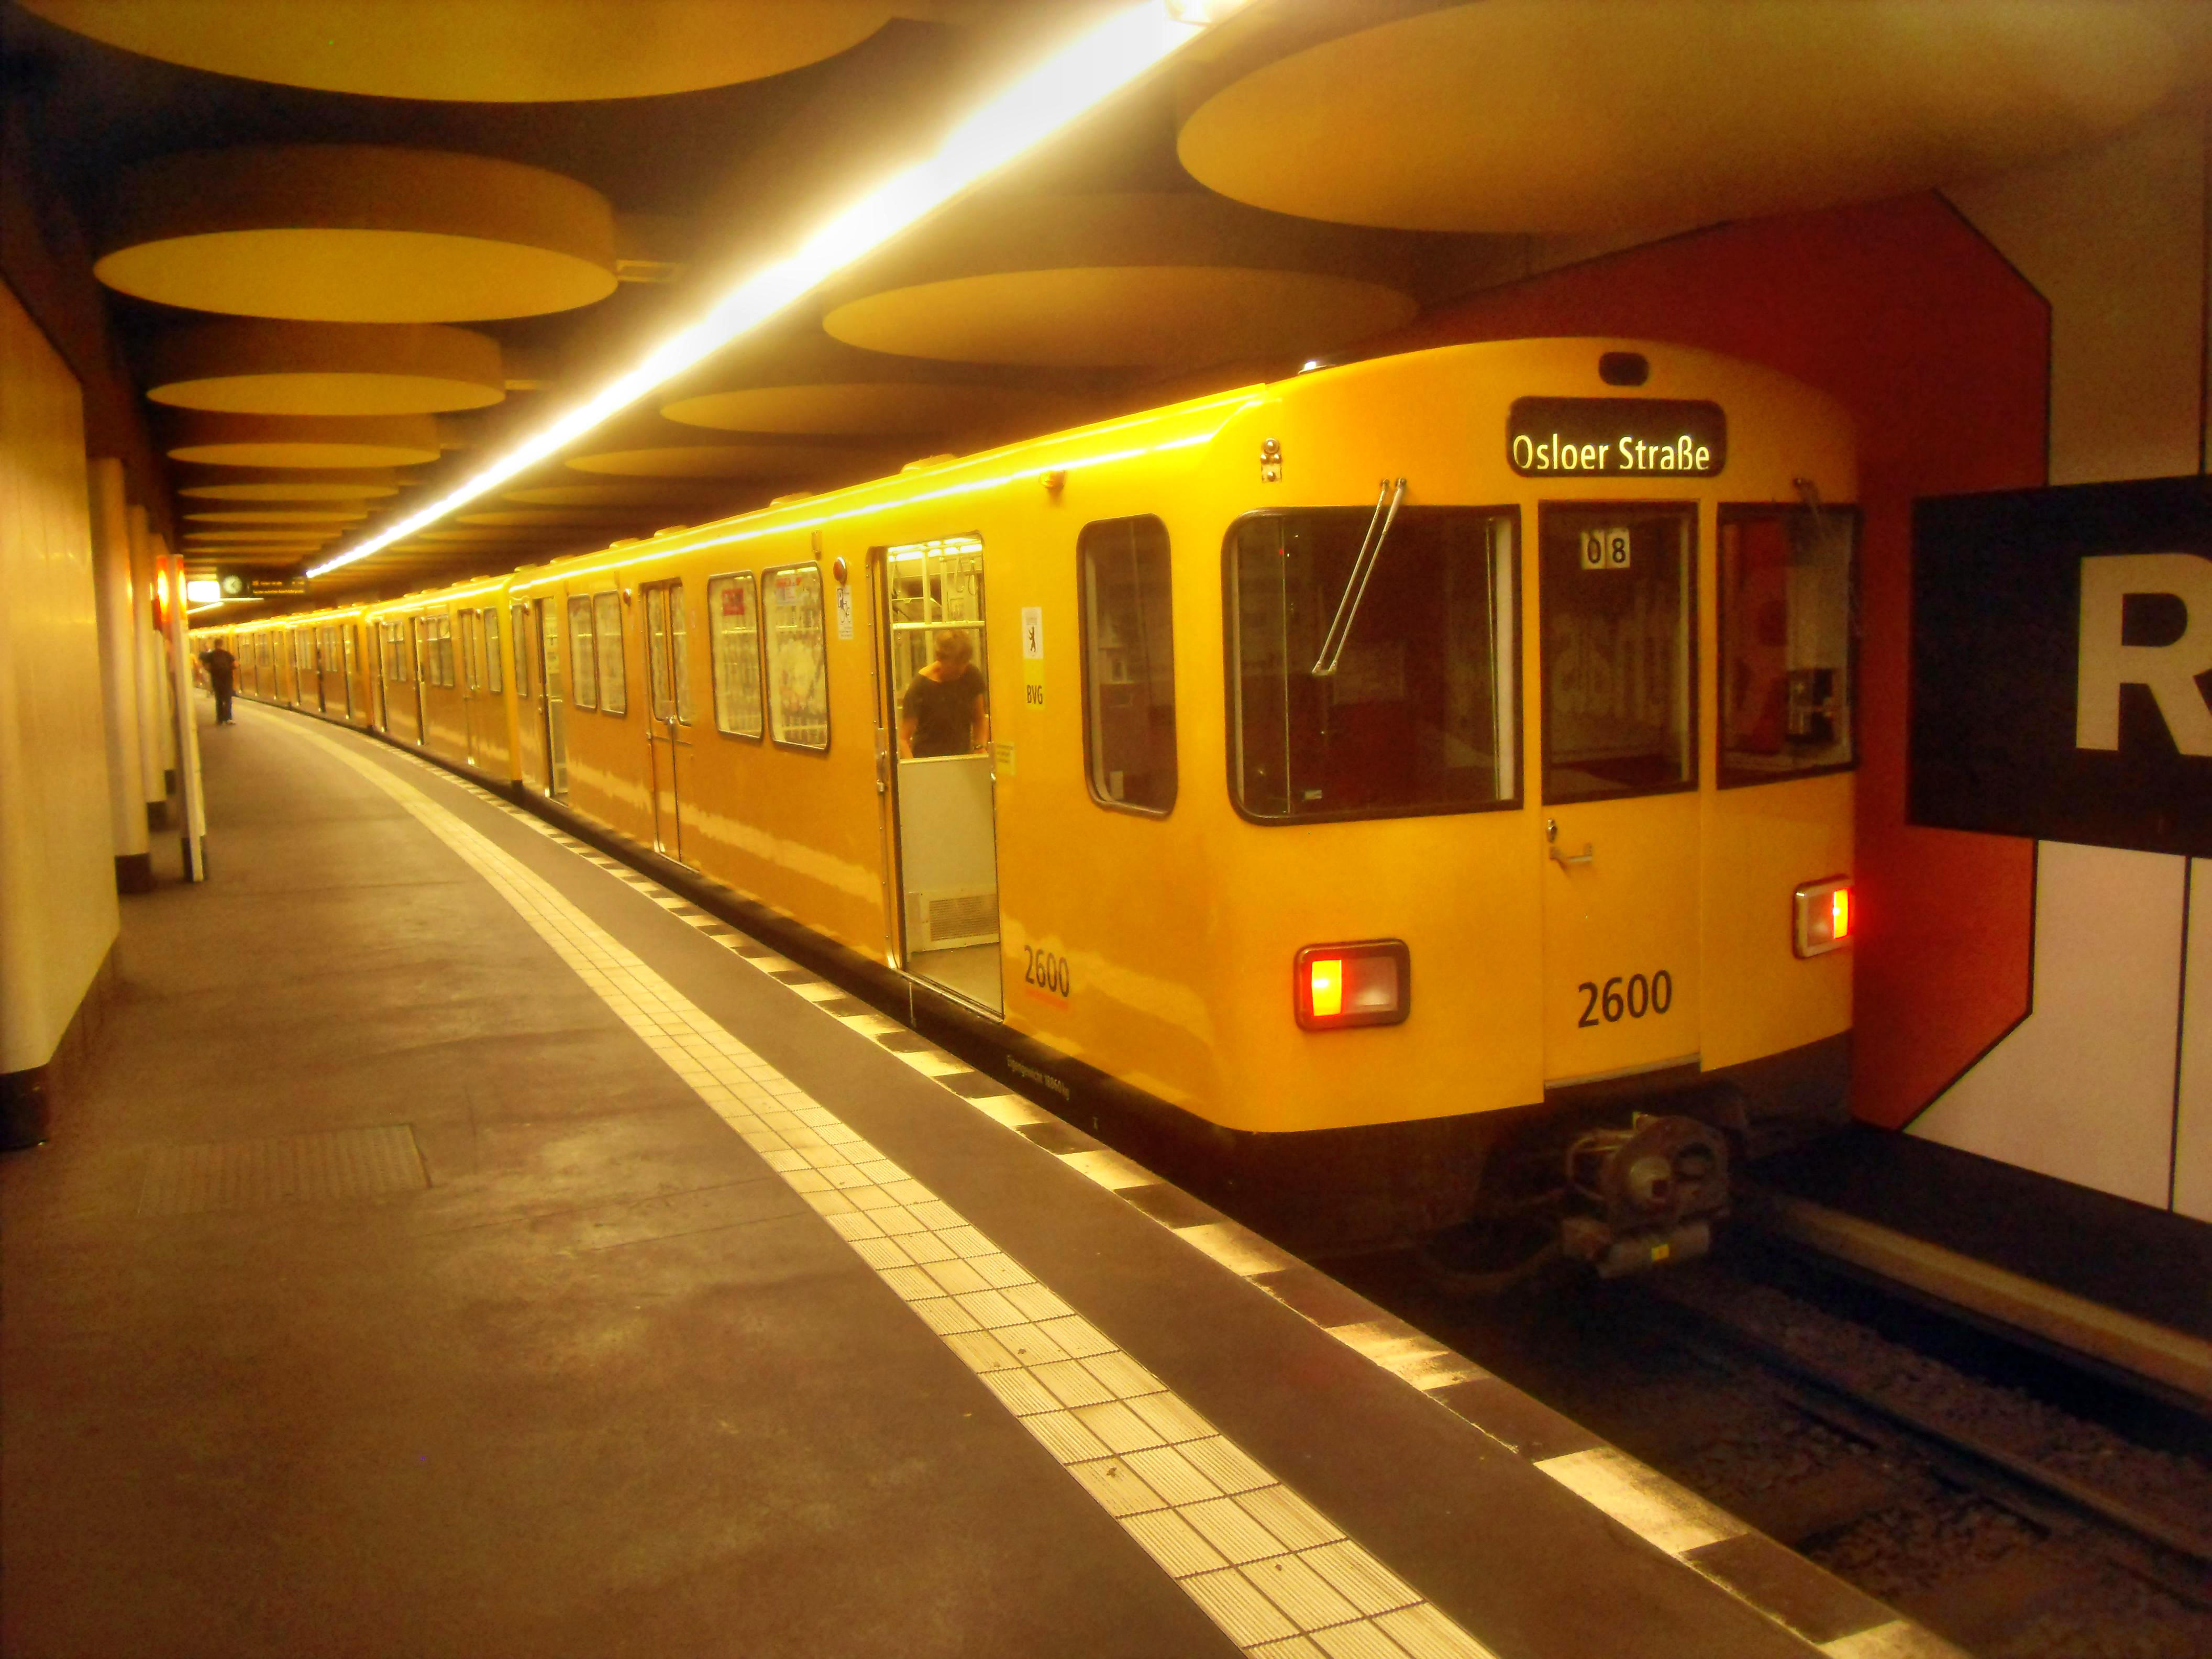 Bahnhof Berlin Rathaus Steglitz